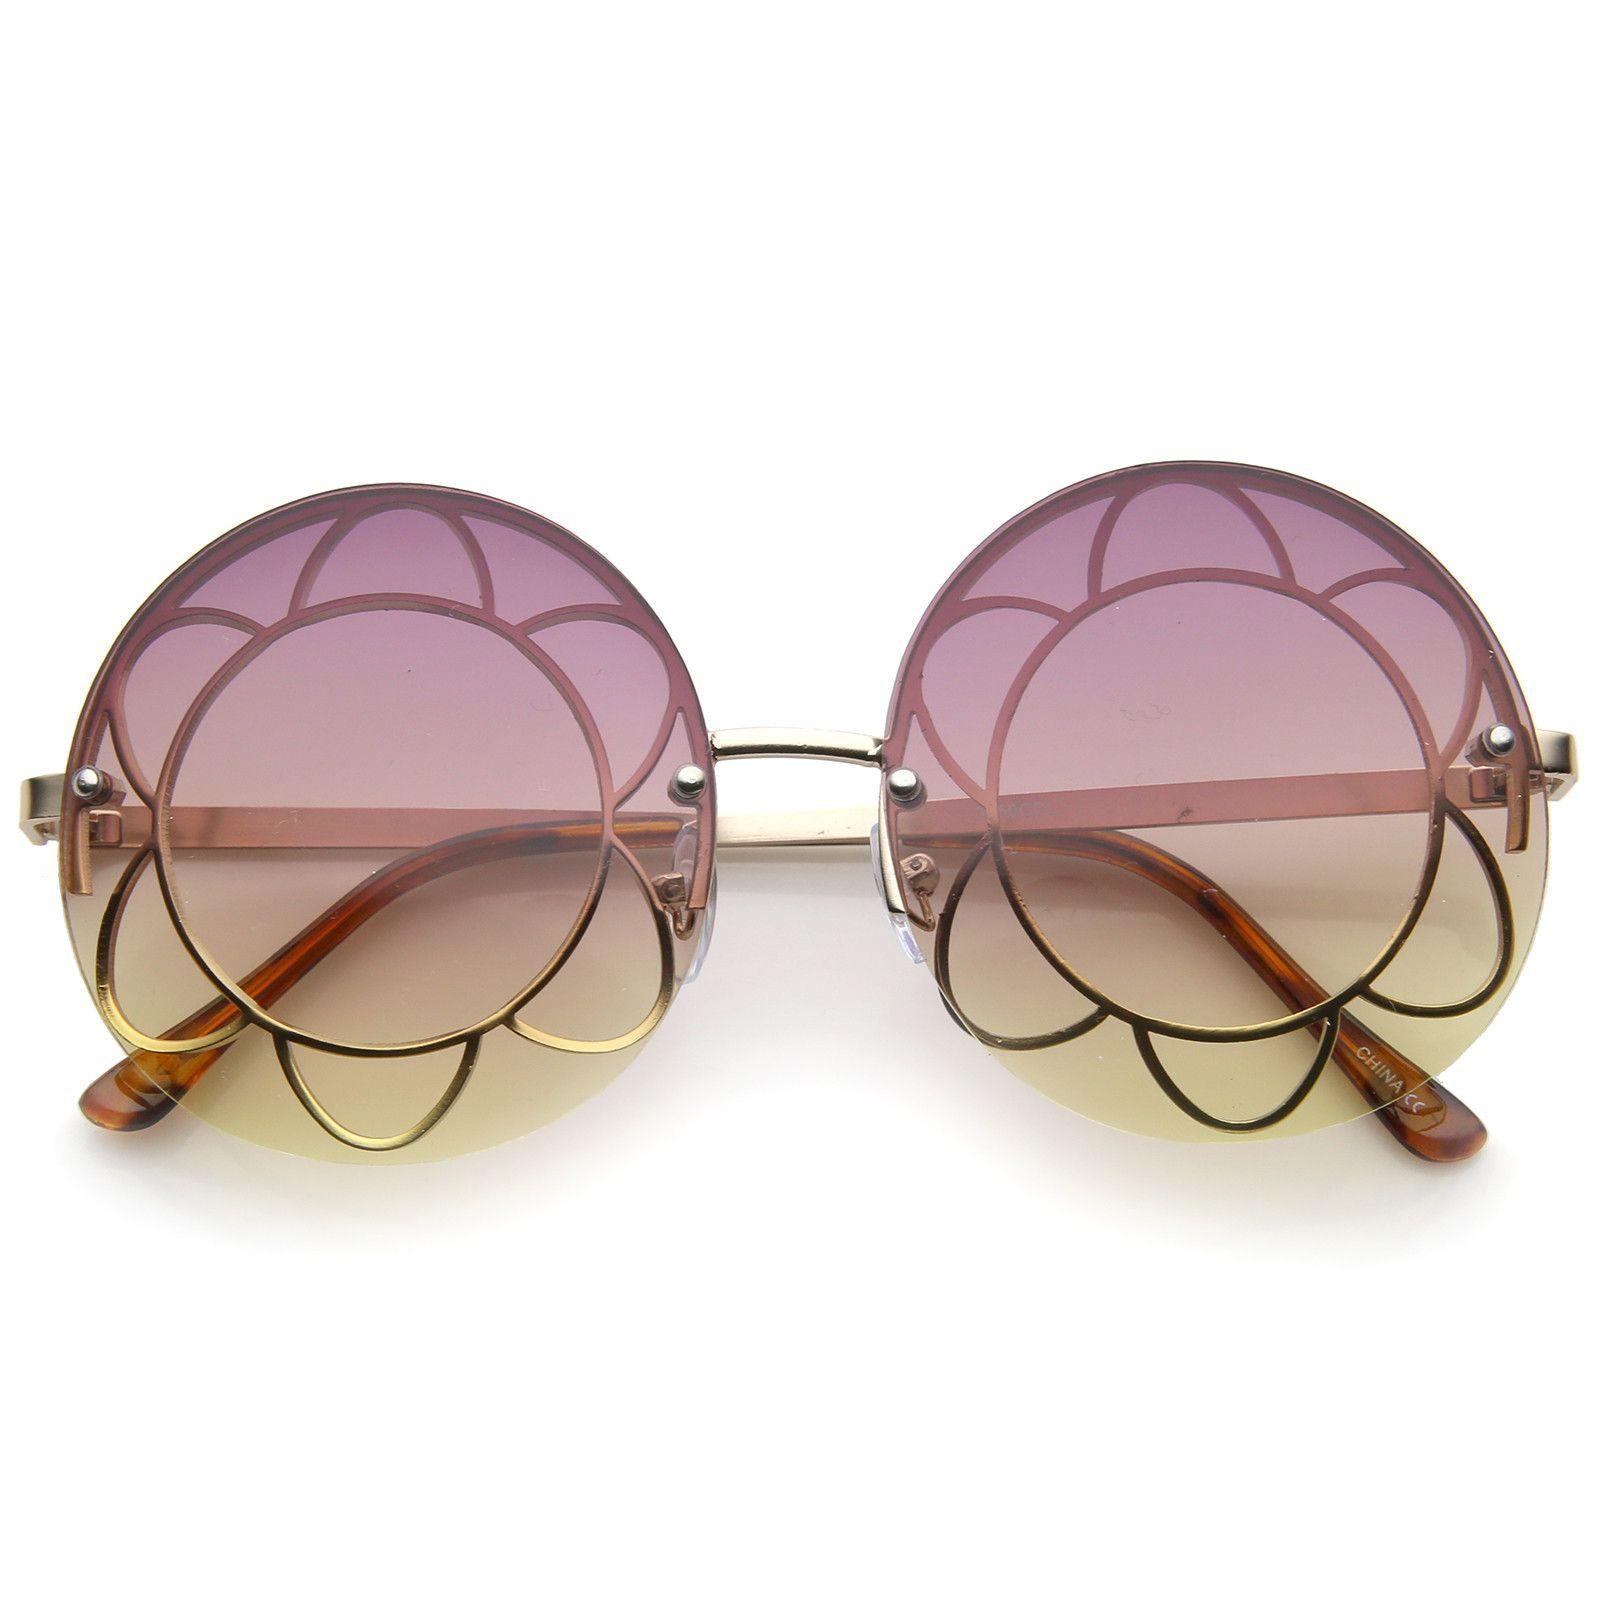 f6cd74a671d Women s Rimless Floral Frame Gradient Color Lens Oversize Round Sunglasses  59mm